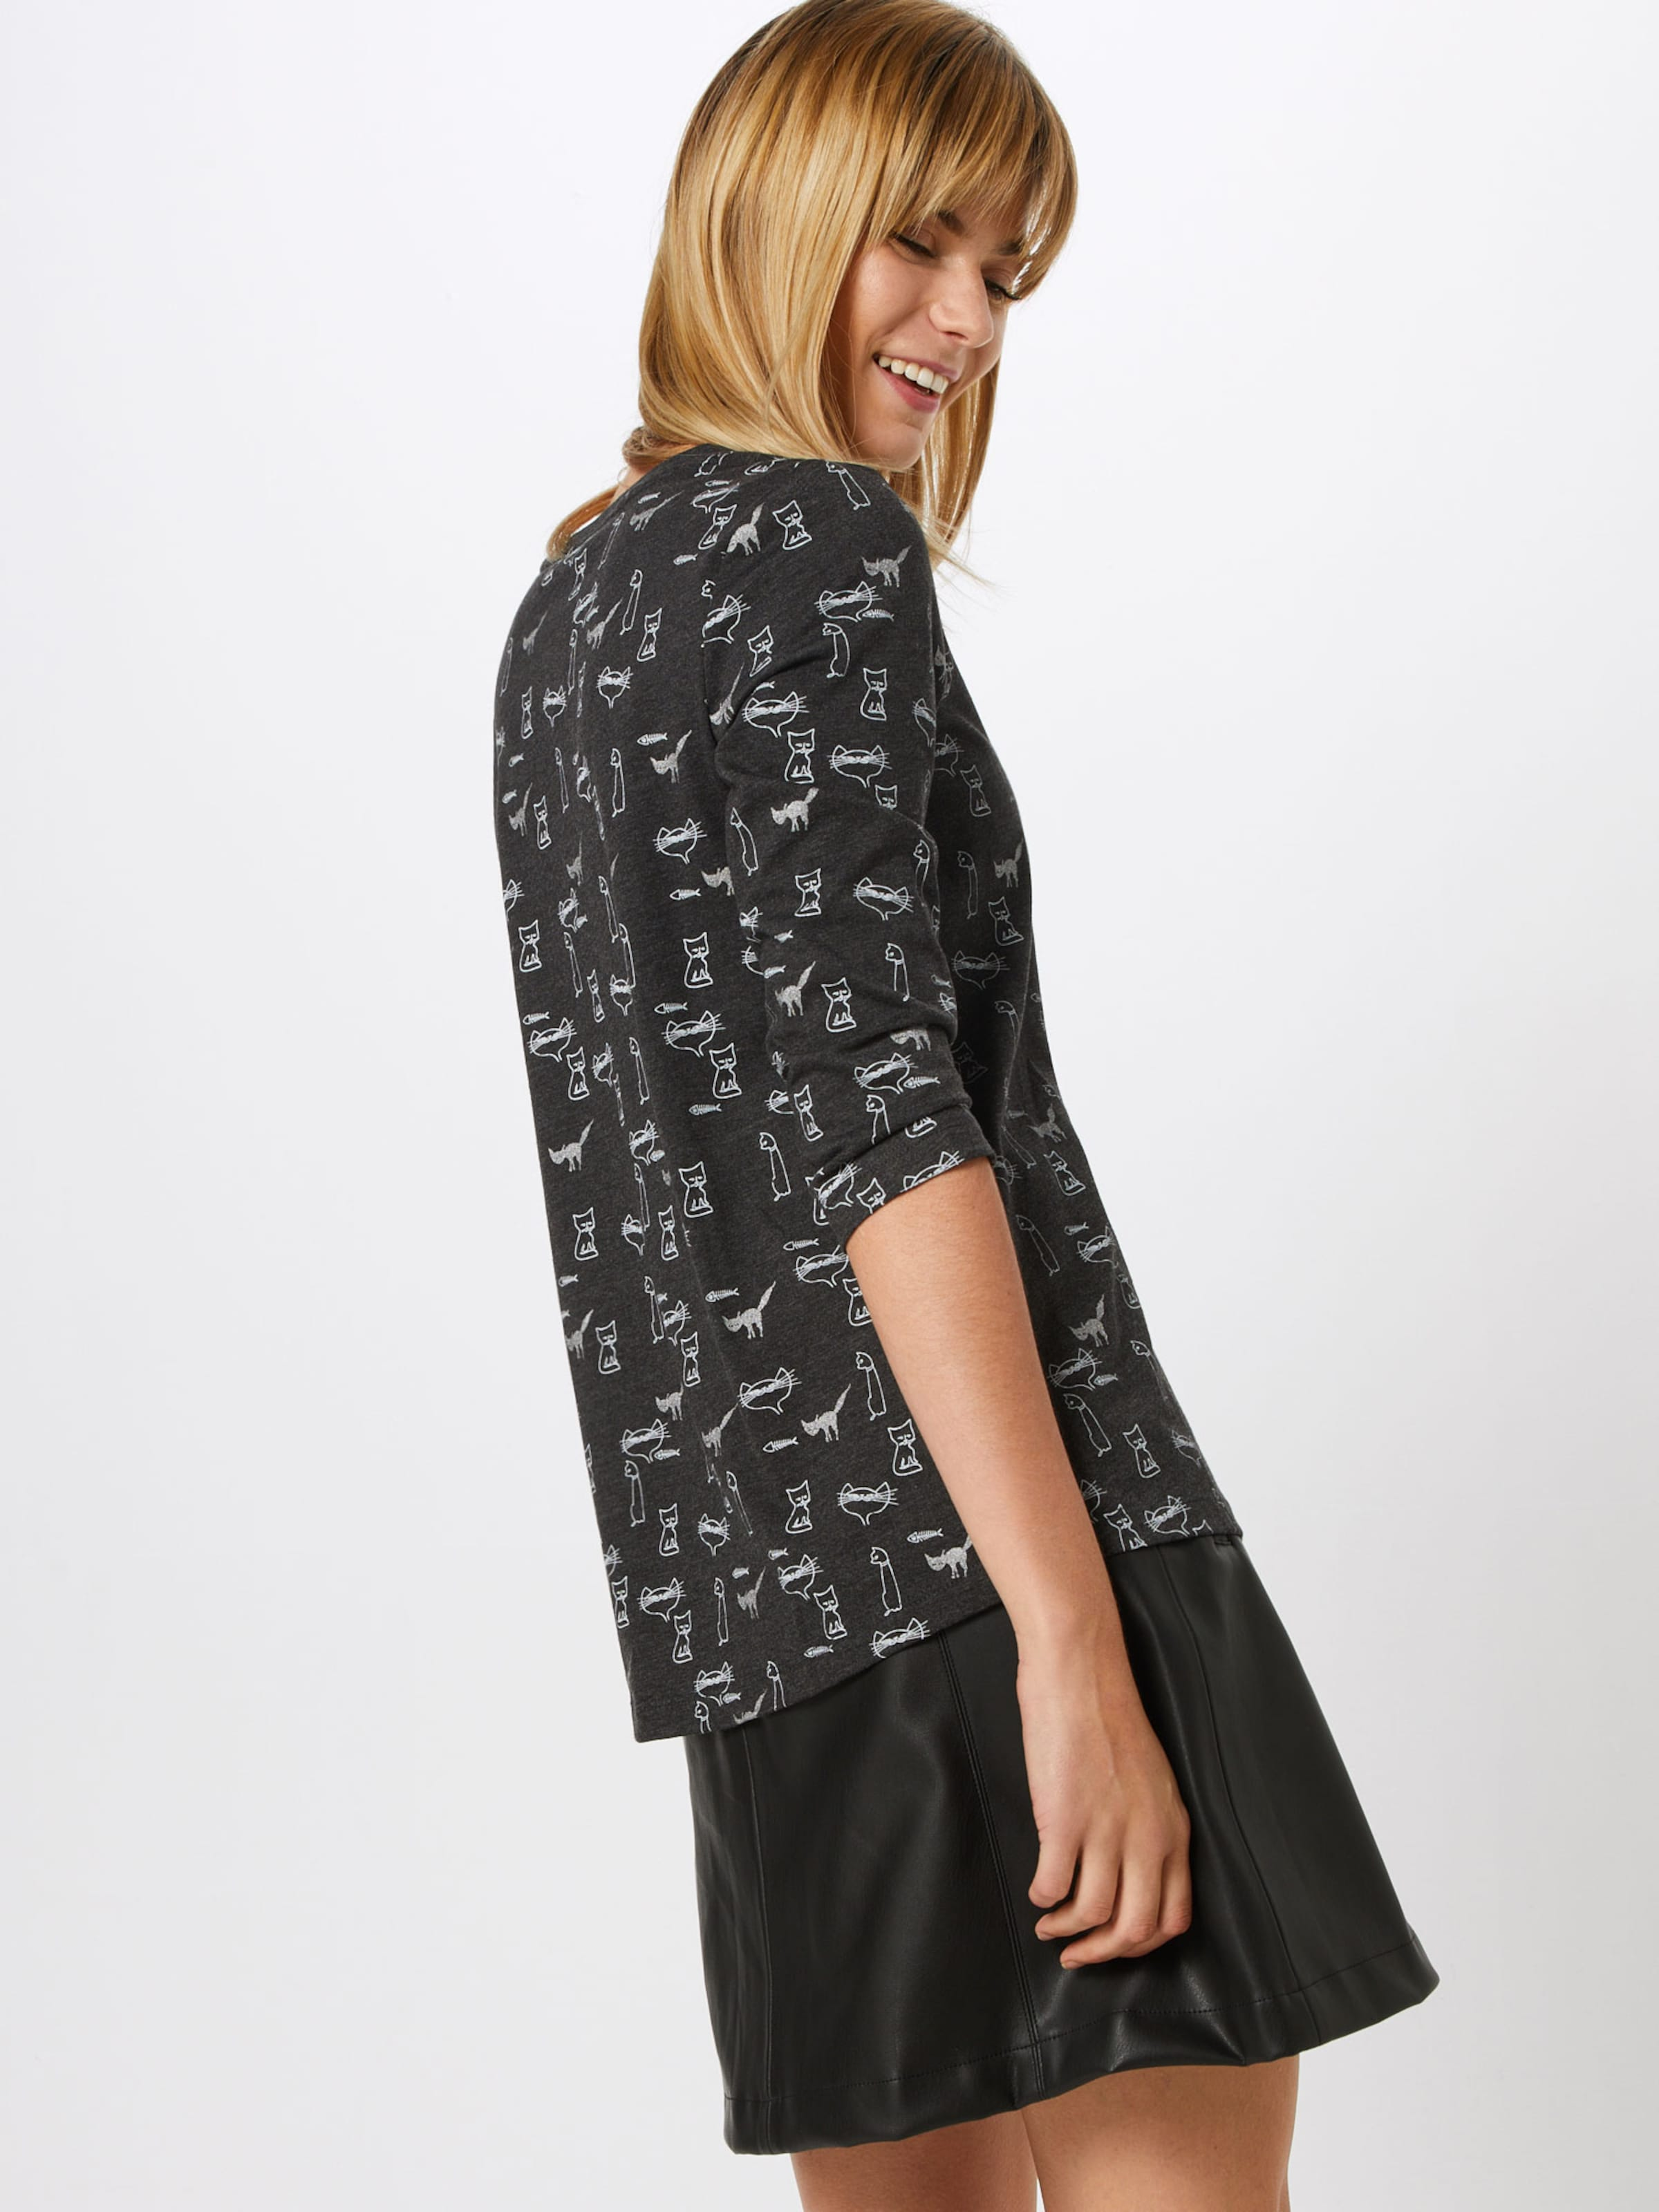 In Edc Esprit Shirt DunkelgrauWeiß By wN8PkXn0O